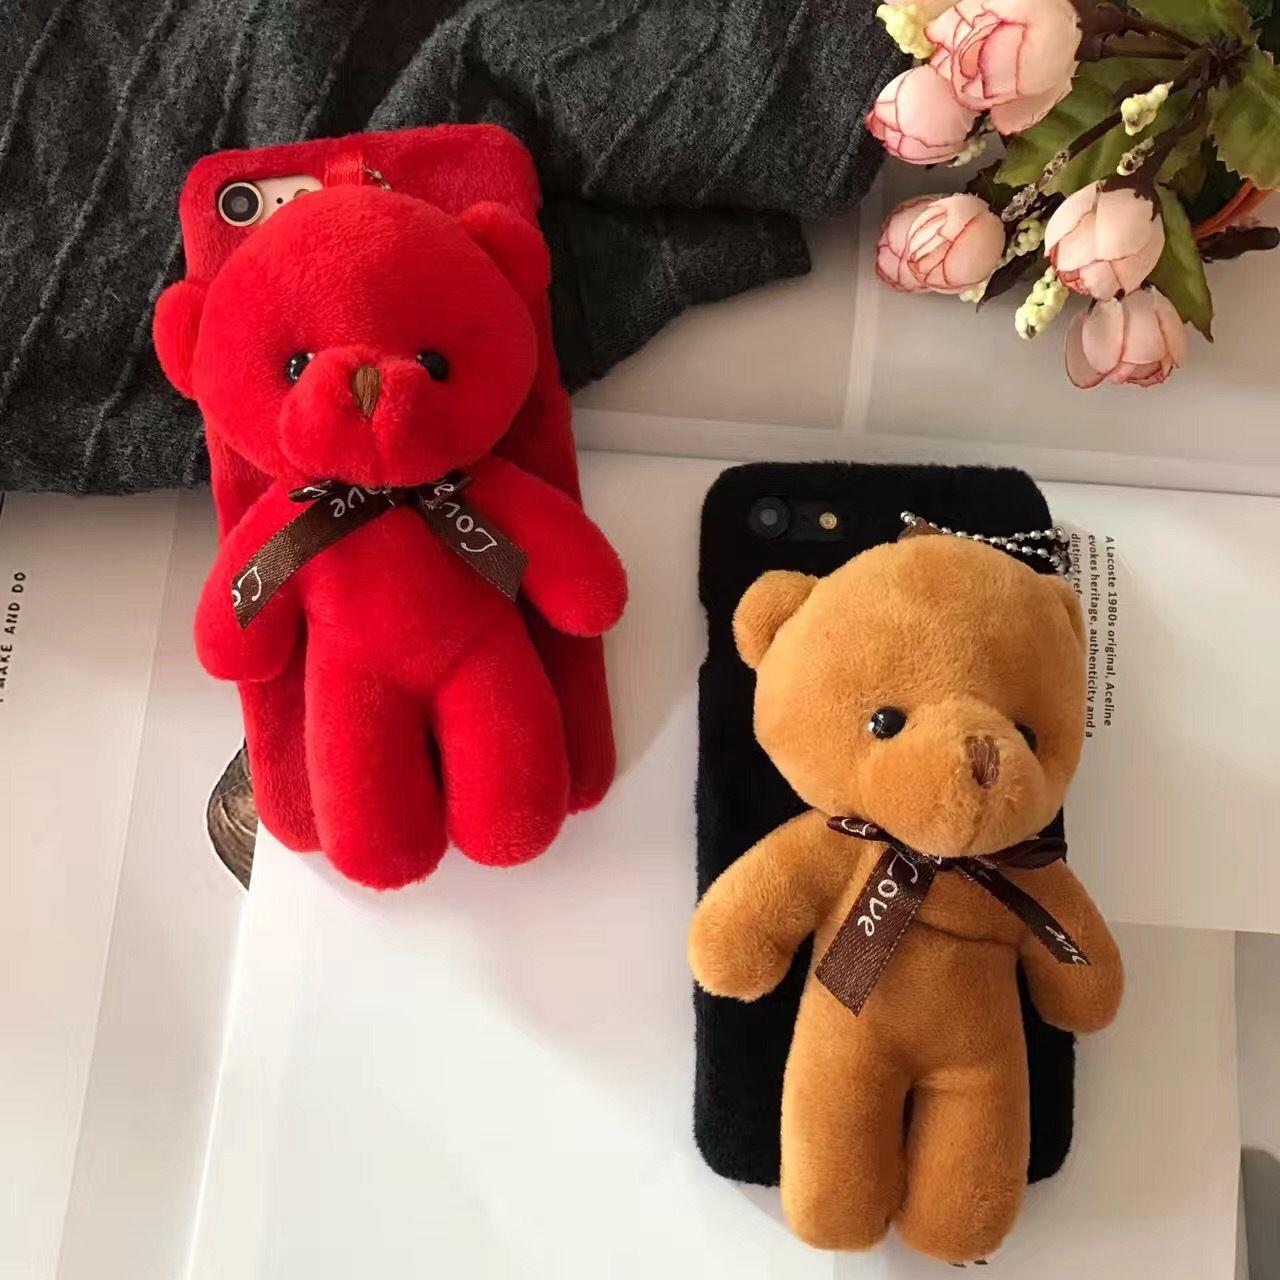 For Apple iphone 6 6s 6plus 6s plus Cute 3D bear plush doll cartoon PC phone cases original smartphone Plastic cover